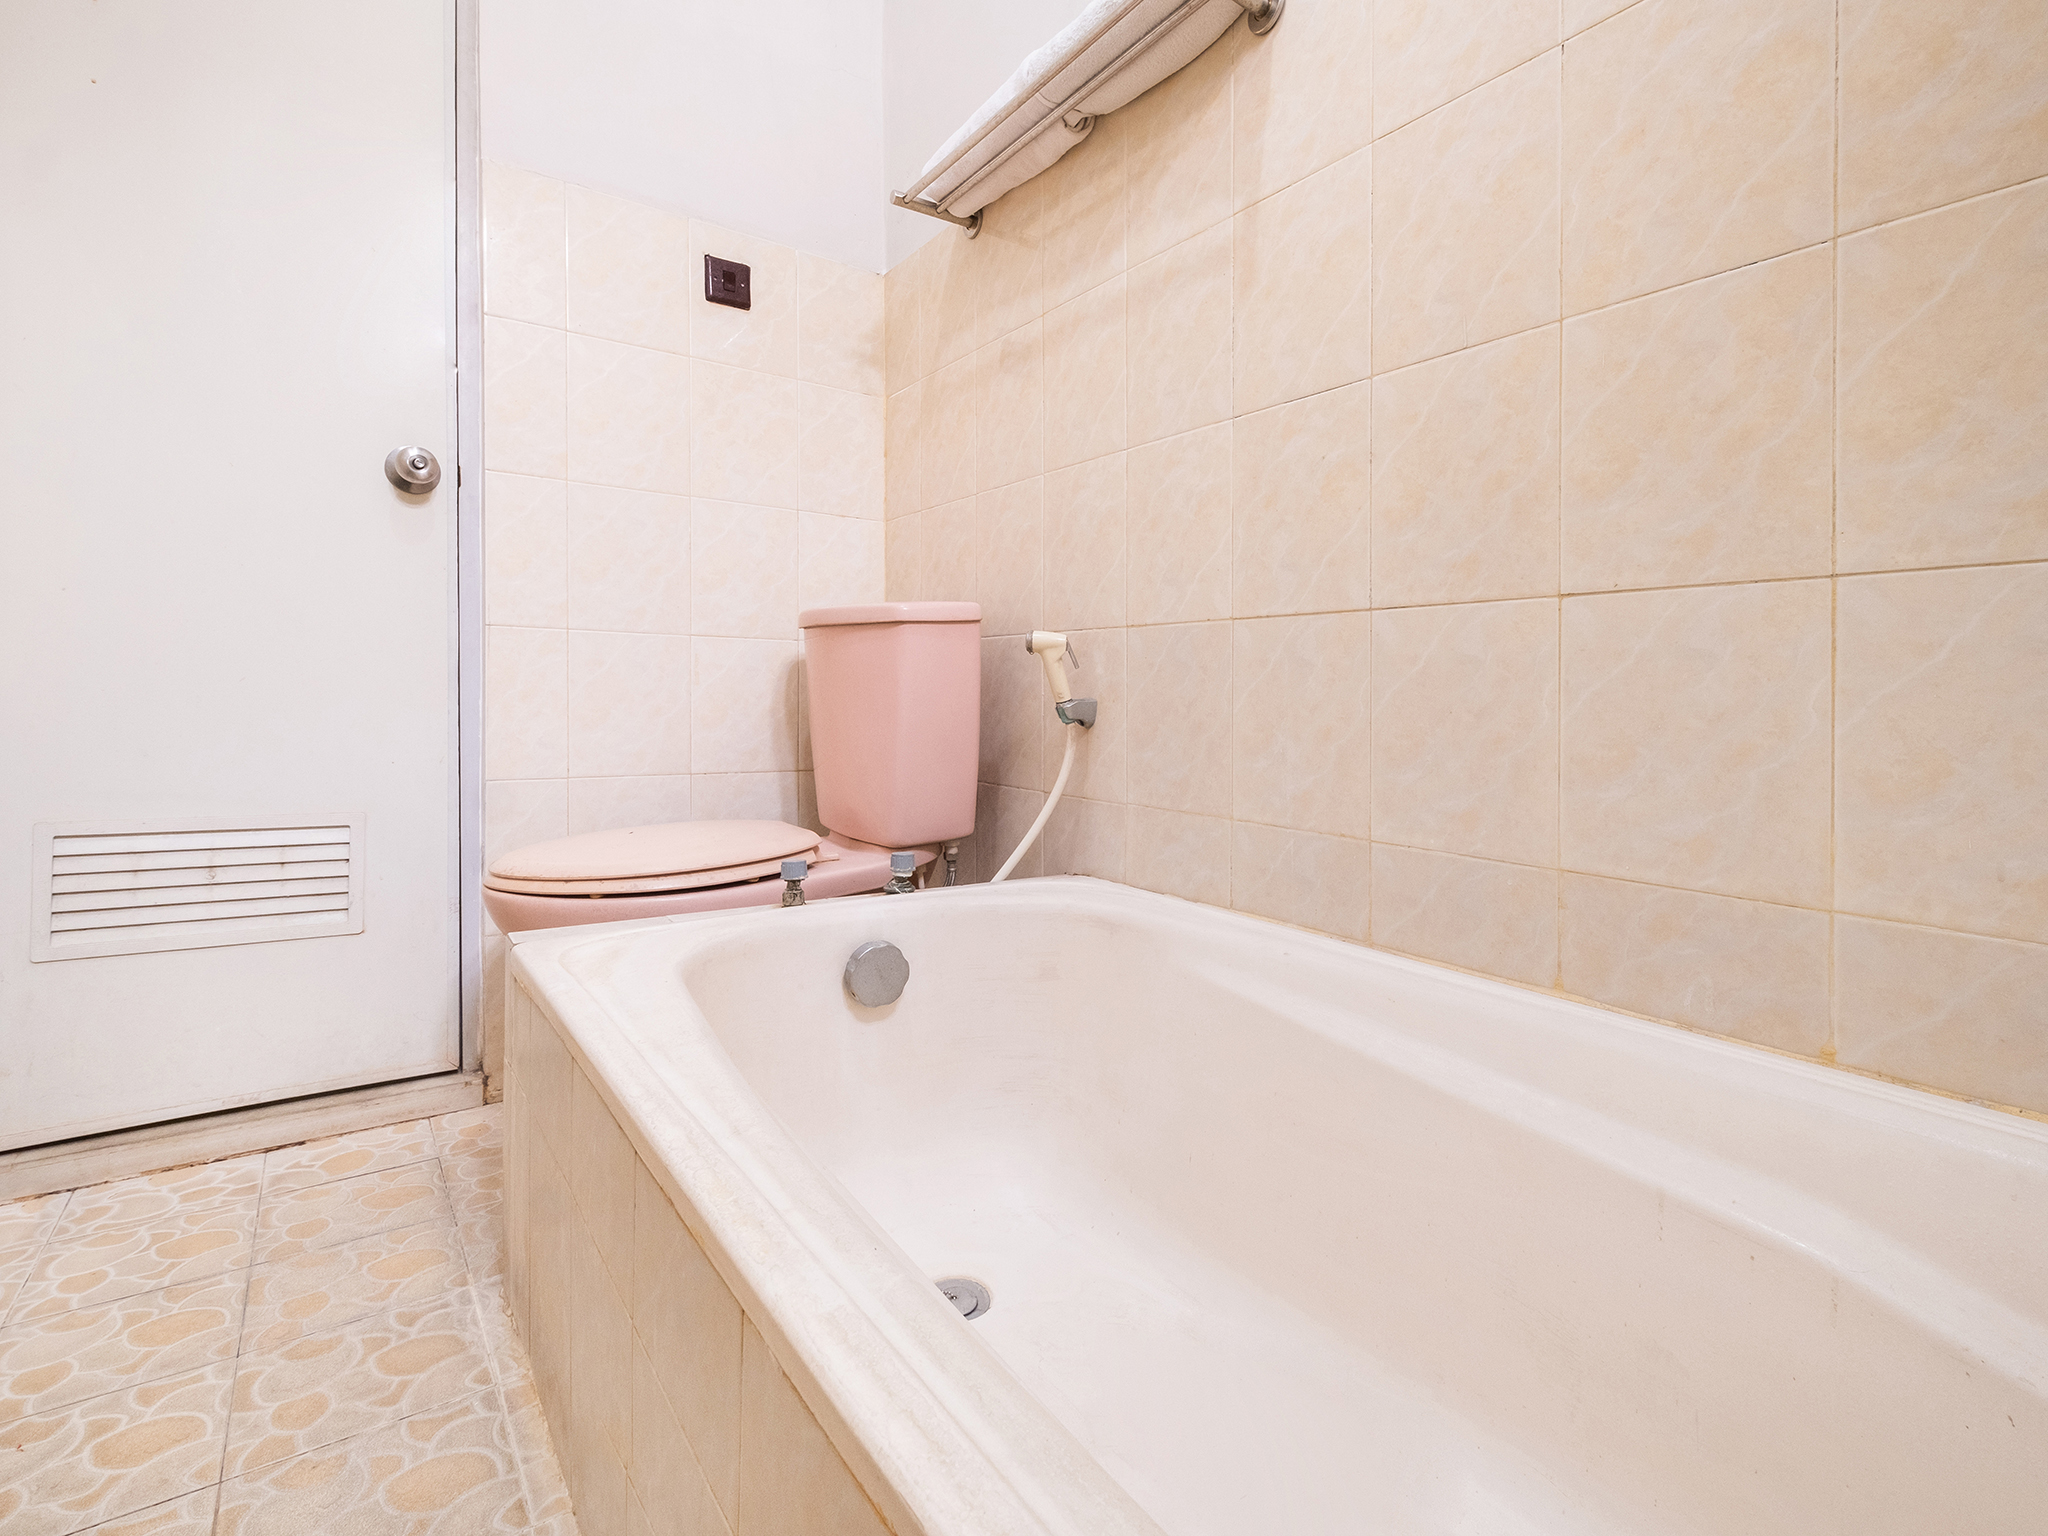 Hotel Oyo 2995 Oemah Sorowajan Homestay Syariah